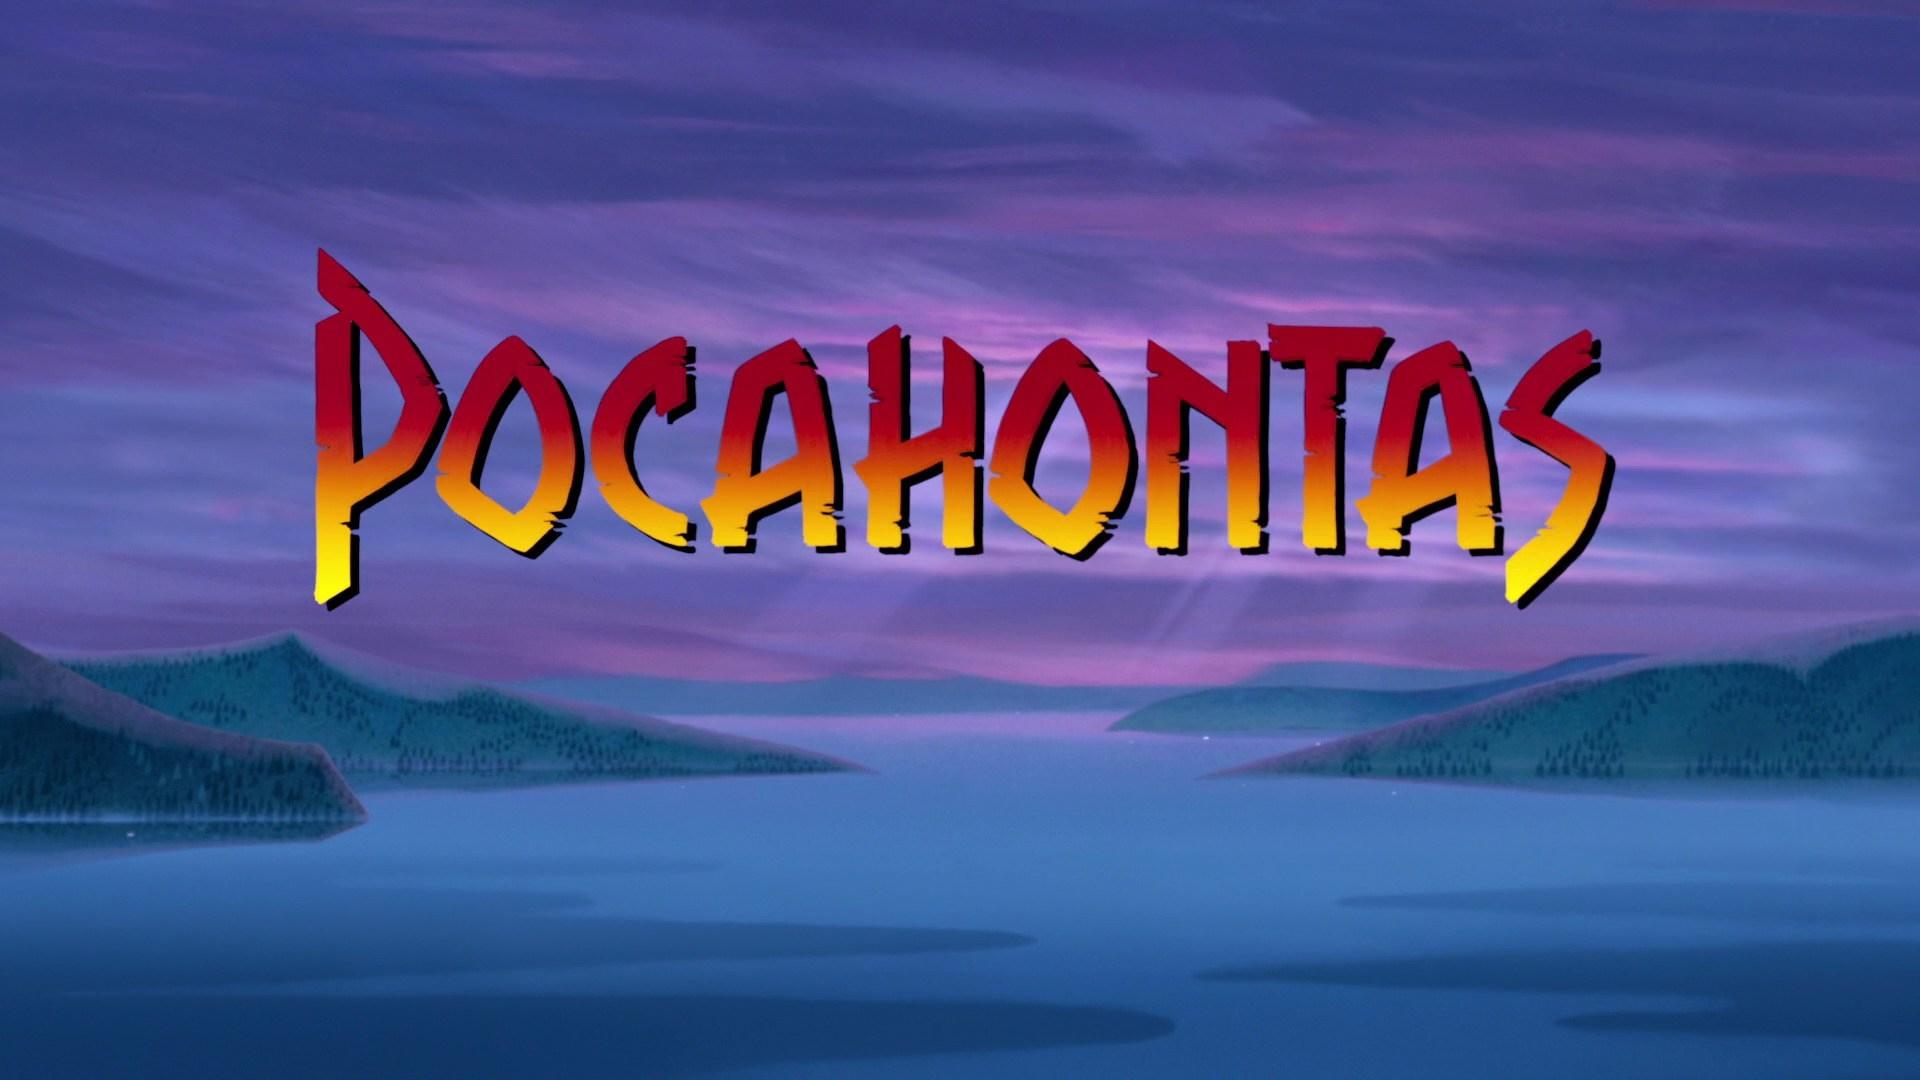 Pocahontas (1995) (@svenskaskolanconn) Cover Image